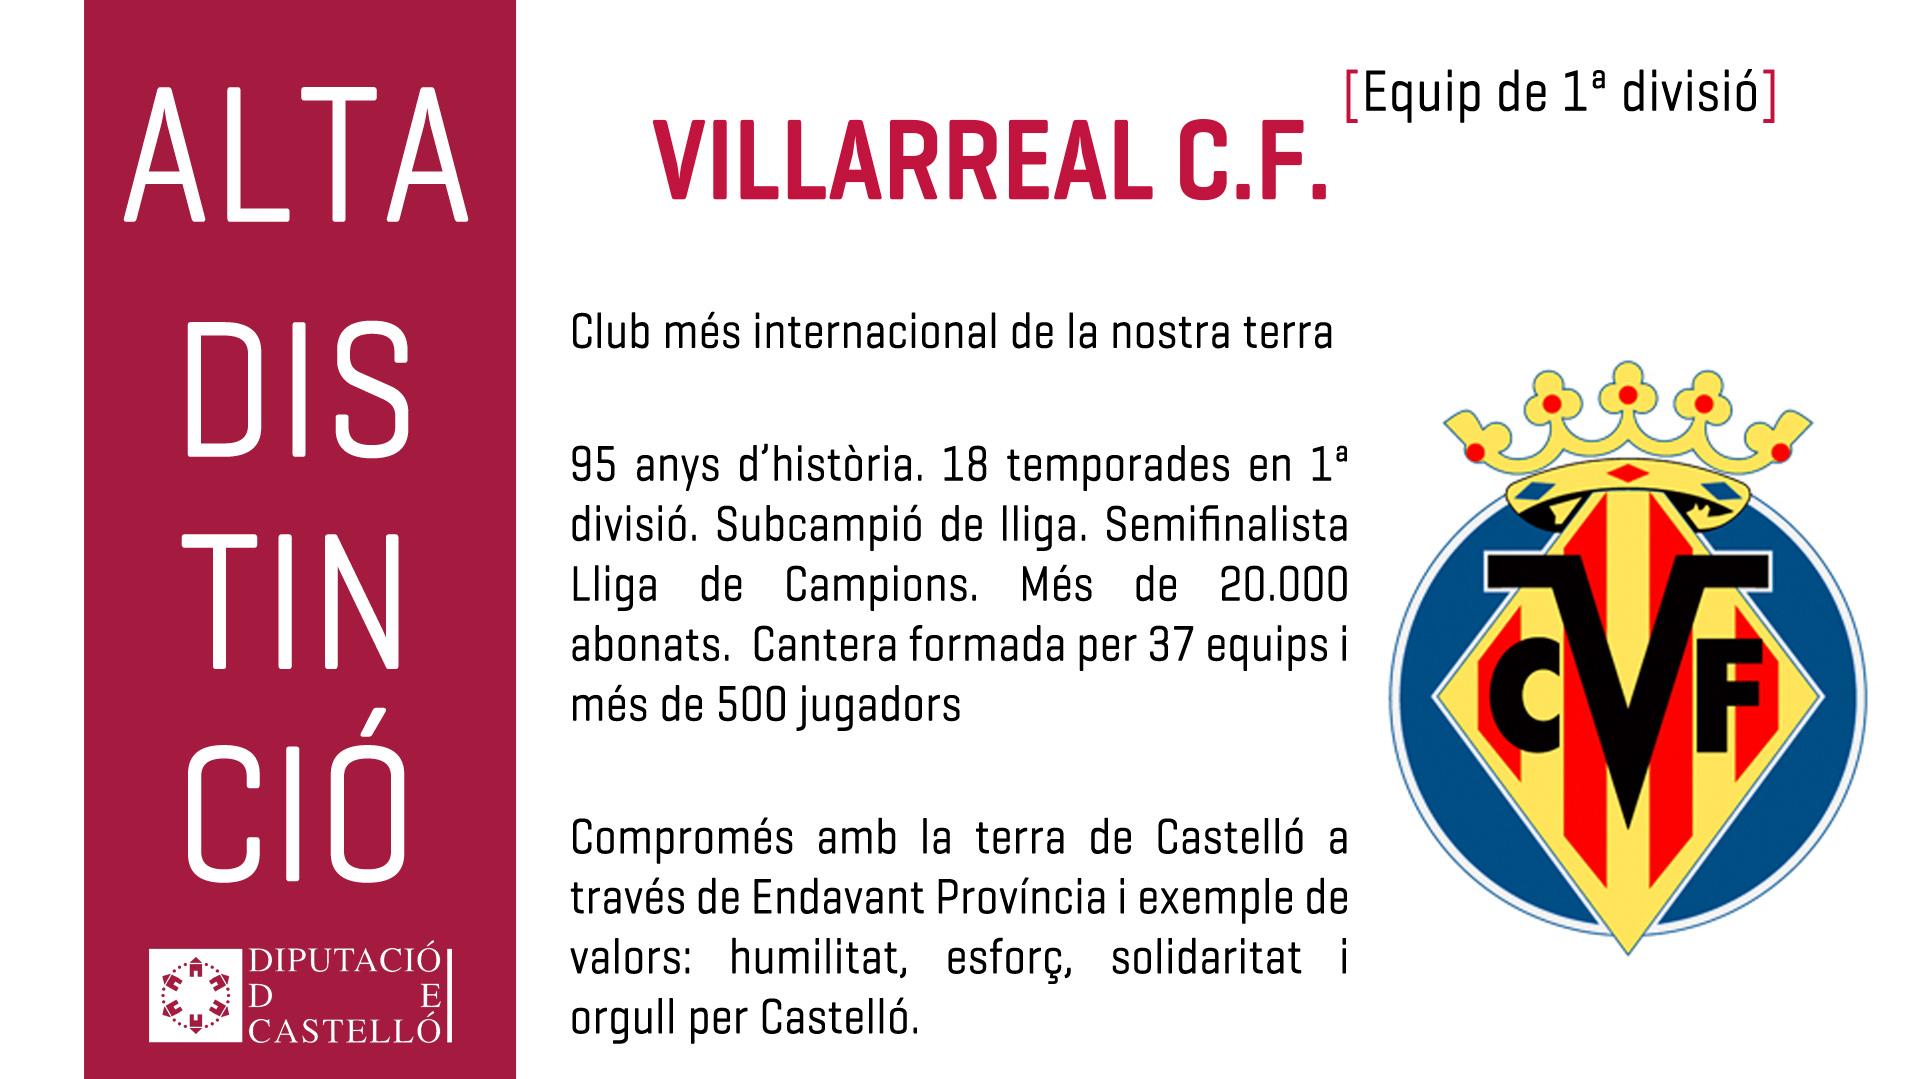 Villareal C.F.